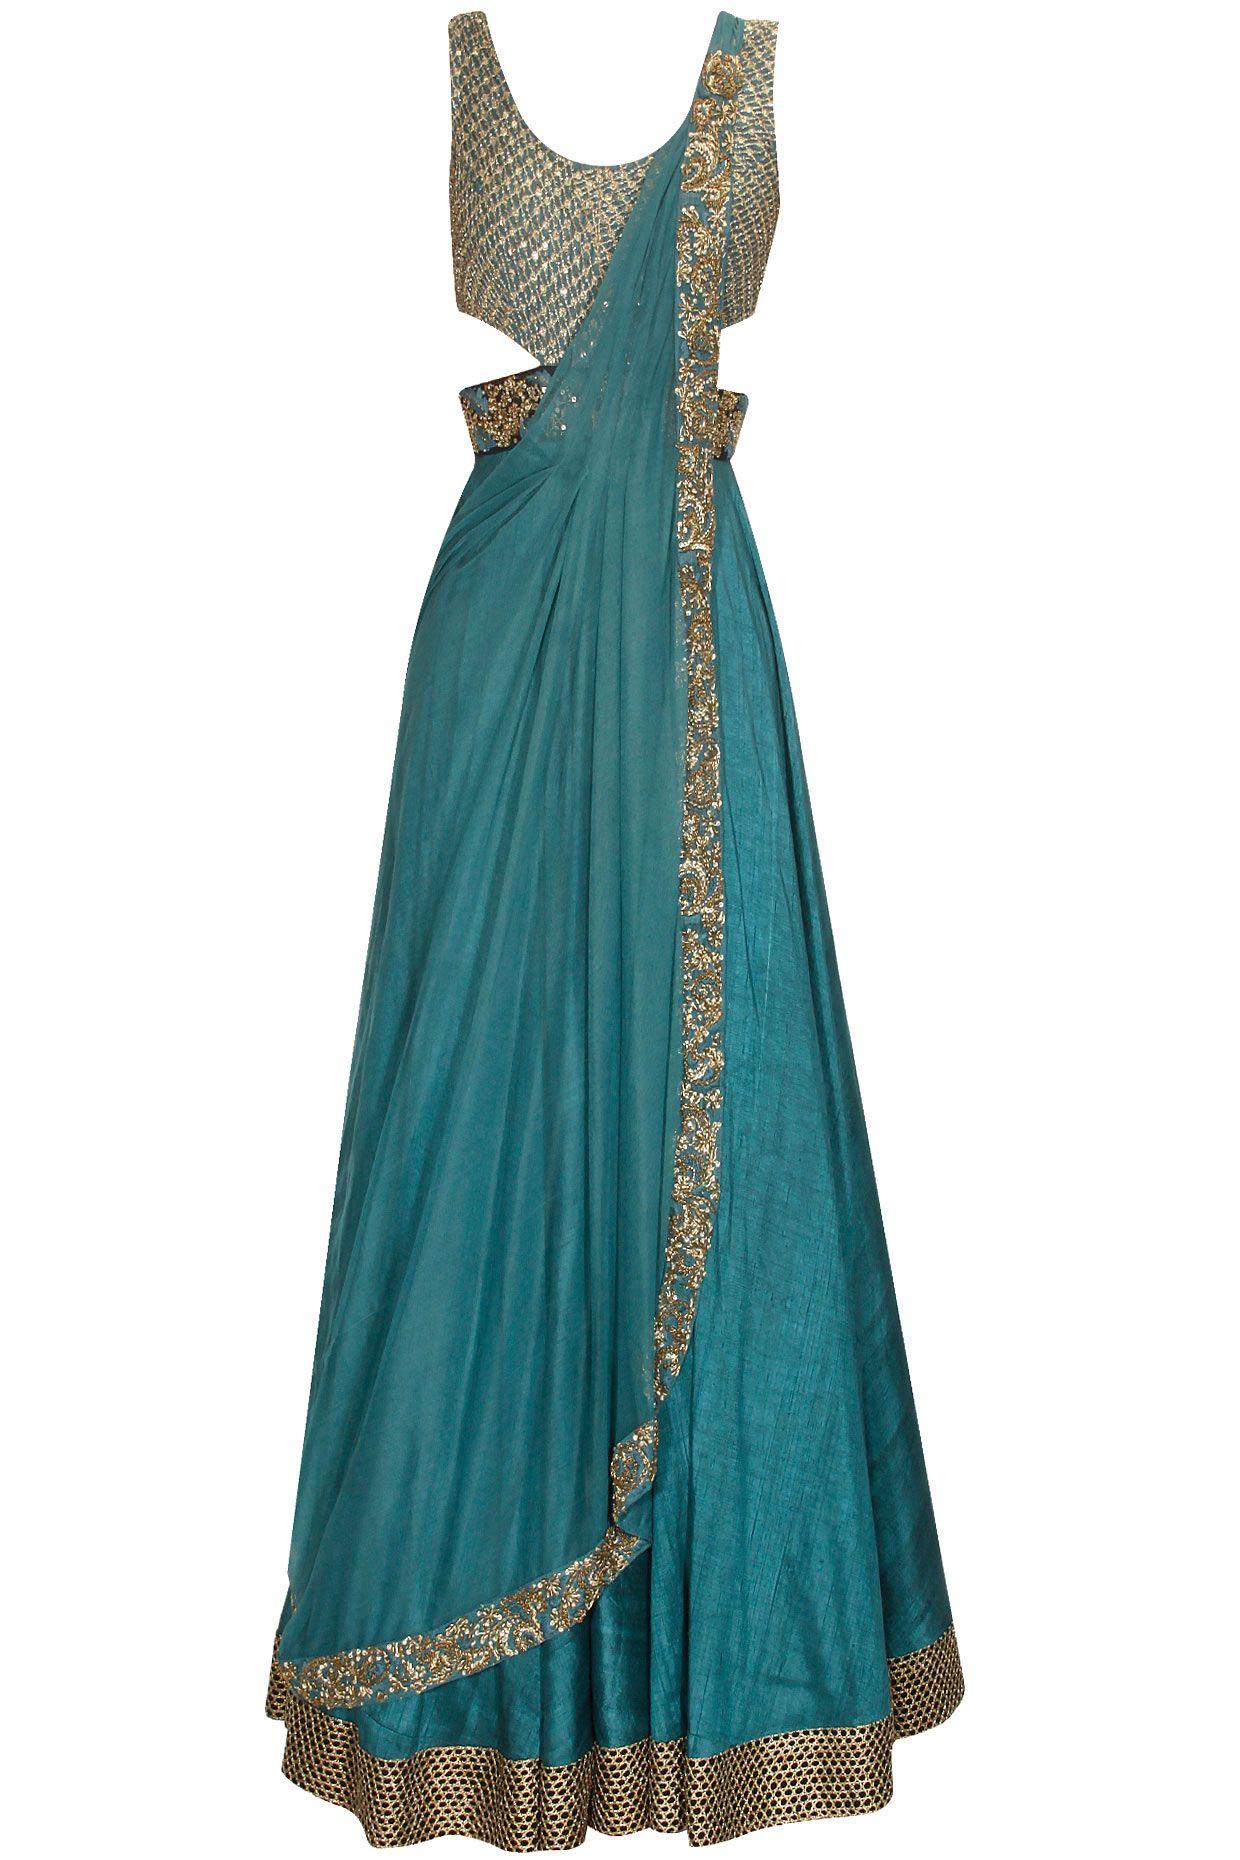 Teal blue dabka and sequins embroidered cowl drape ...